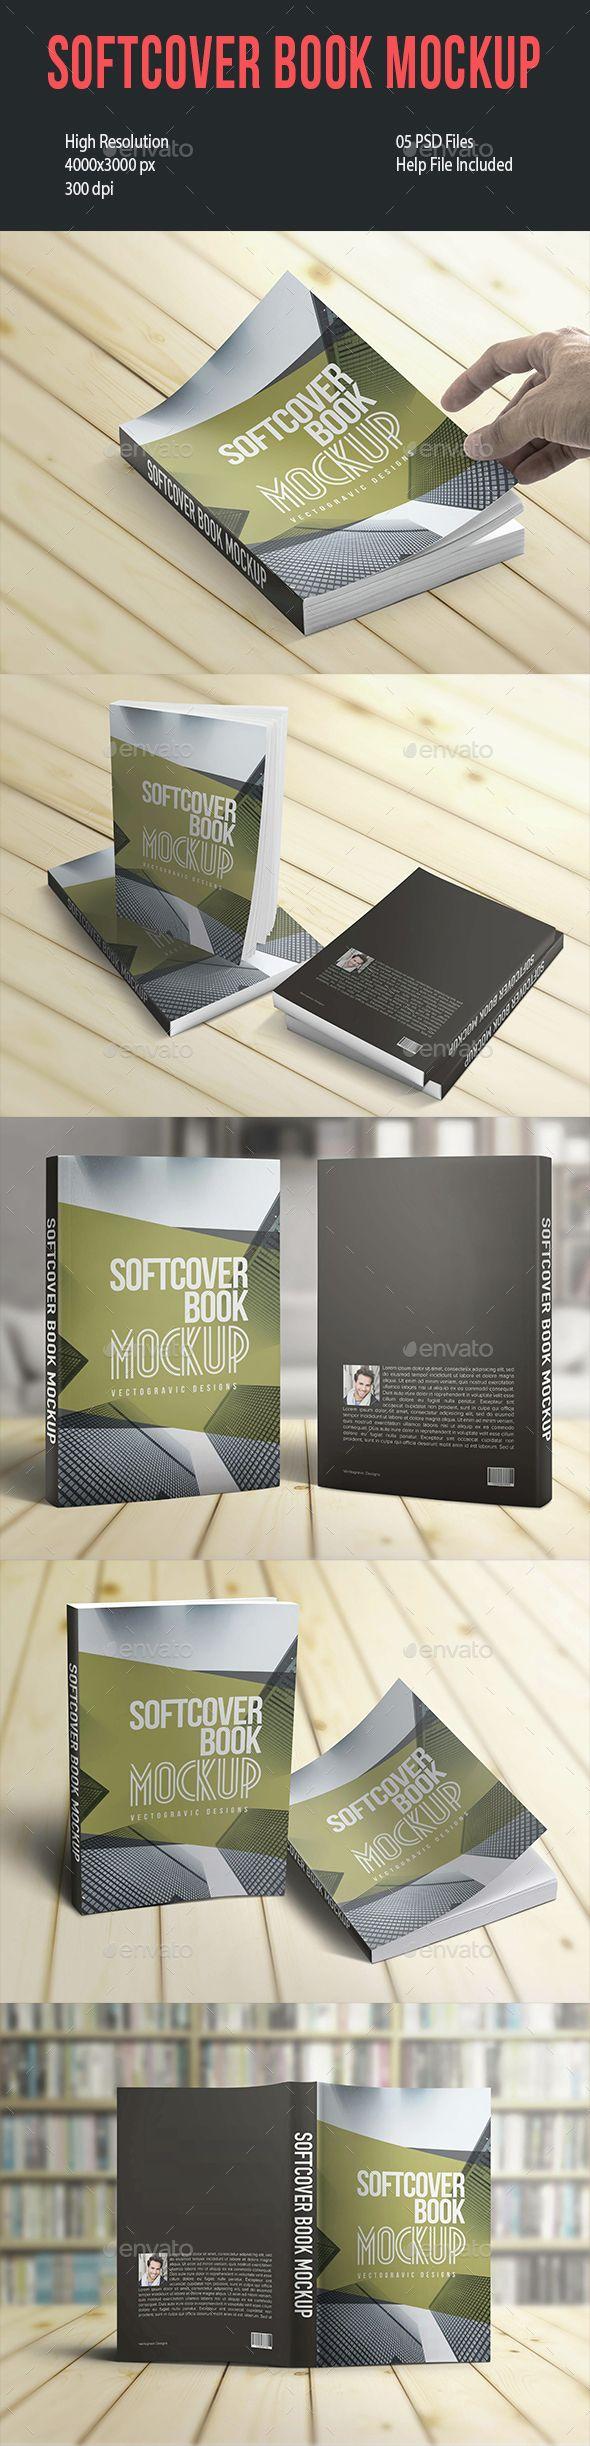 Softcover Book Mockup - Books Print | Download http://graphicriver.net/item/softcover-book-mockup/14599990?ref=sinzo